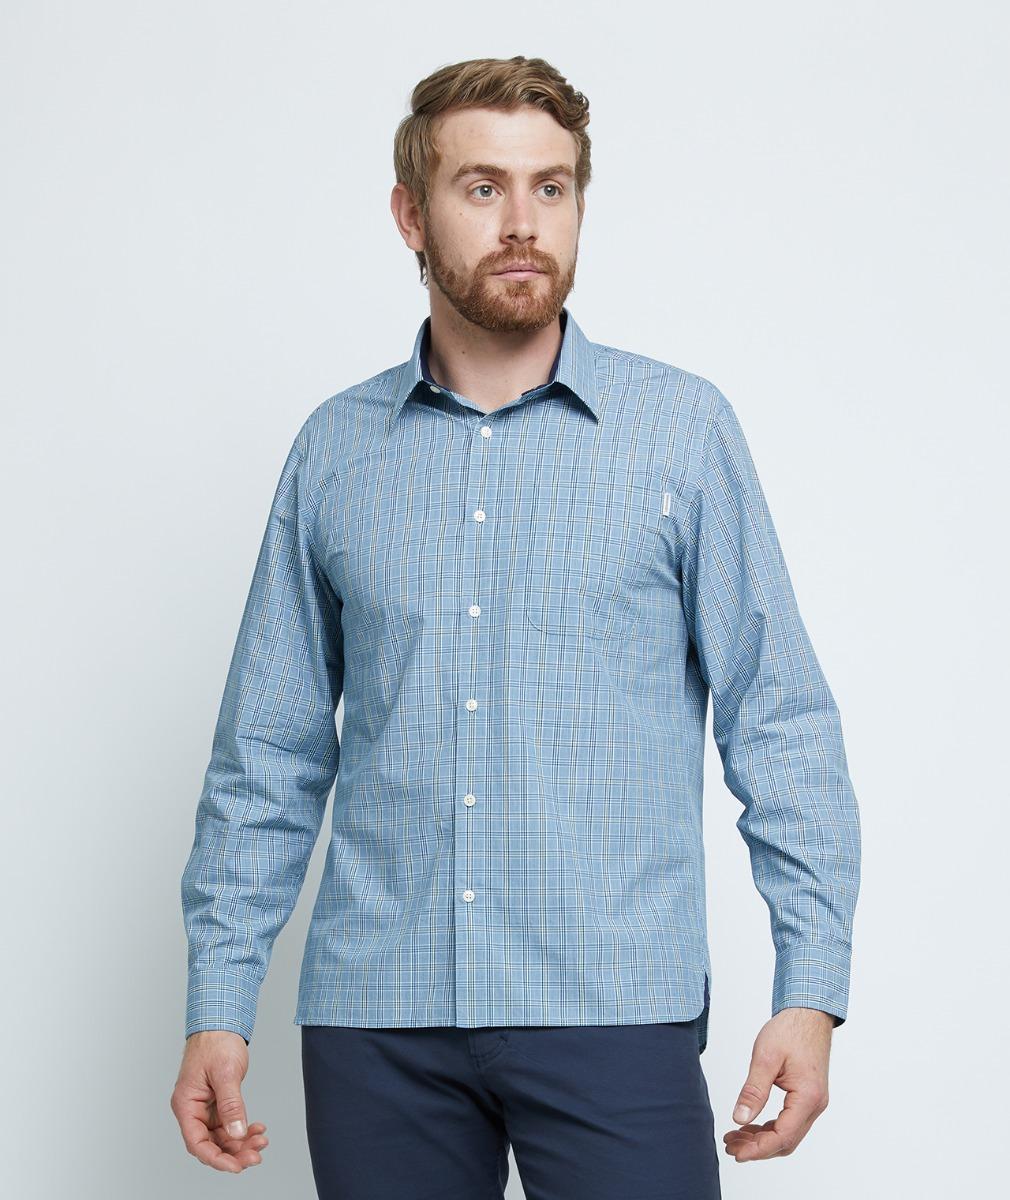 Swanndri Men's Eddison Cotton Long Sleeve Shirt